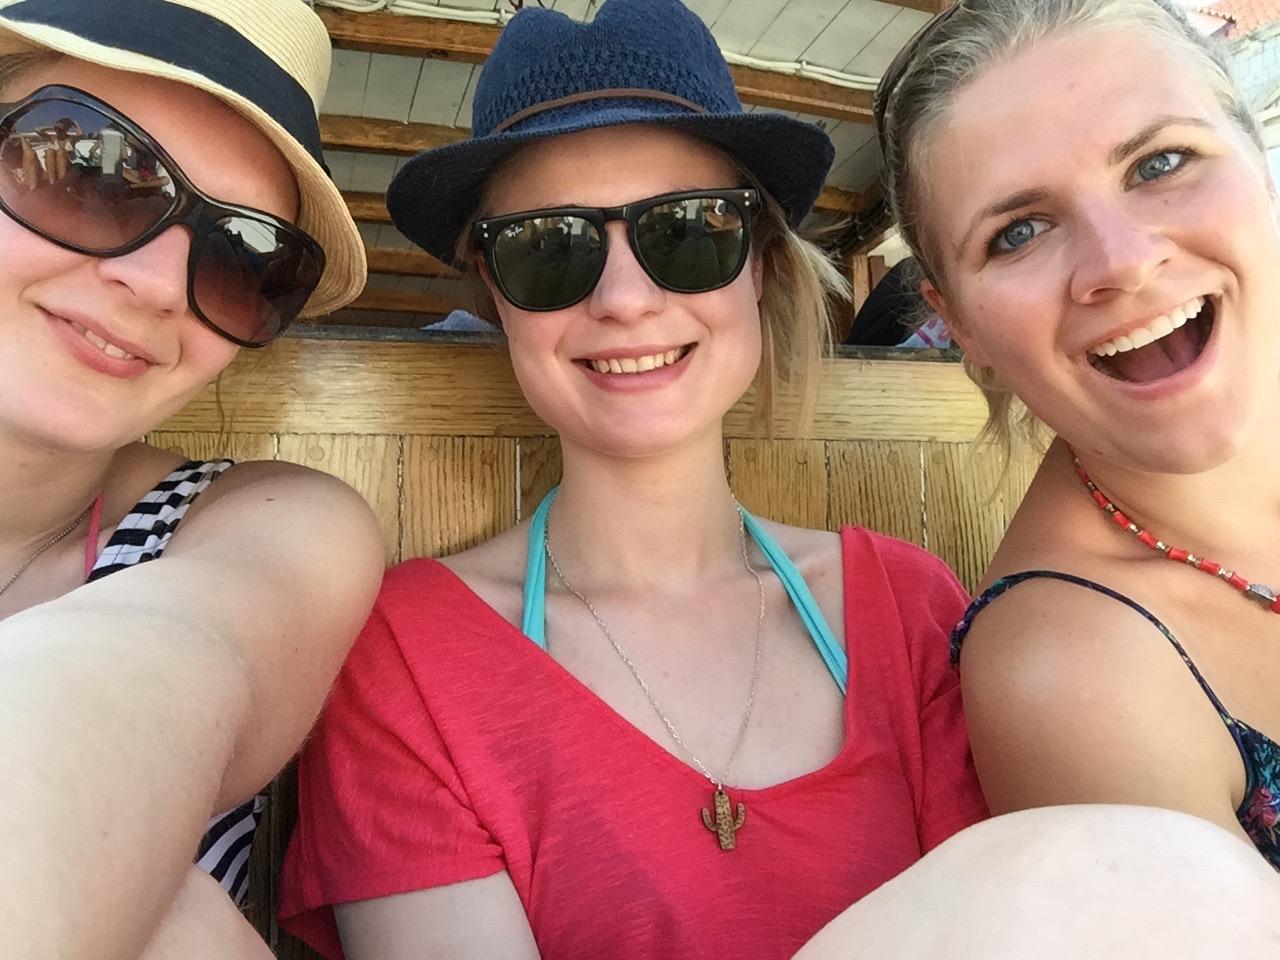 Pre-sail selfie, pre-tan and pre-sun burn